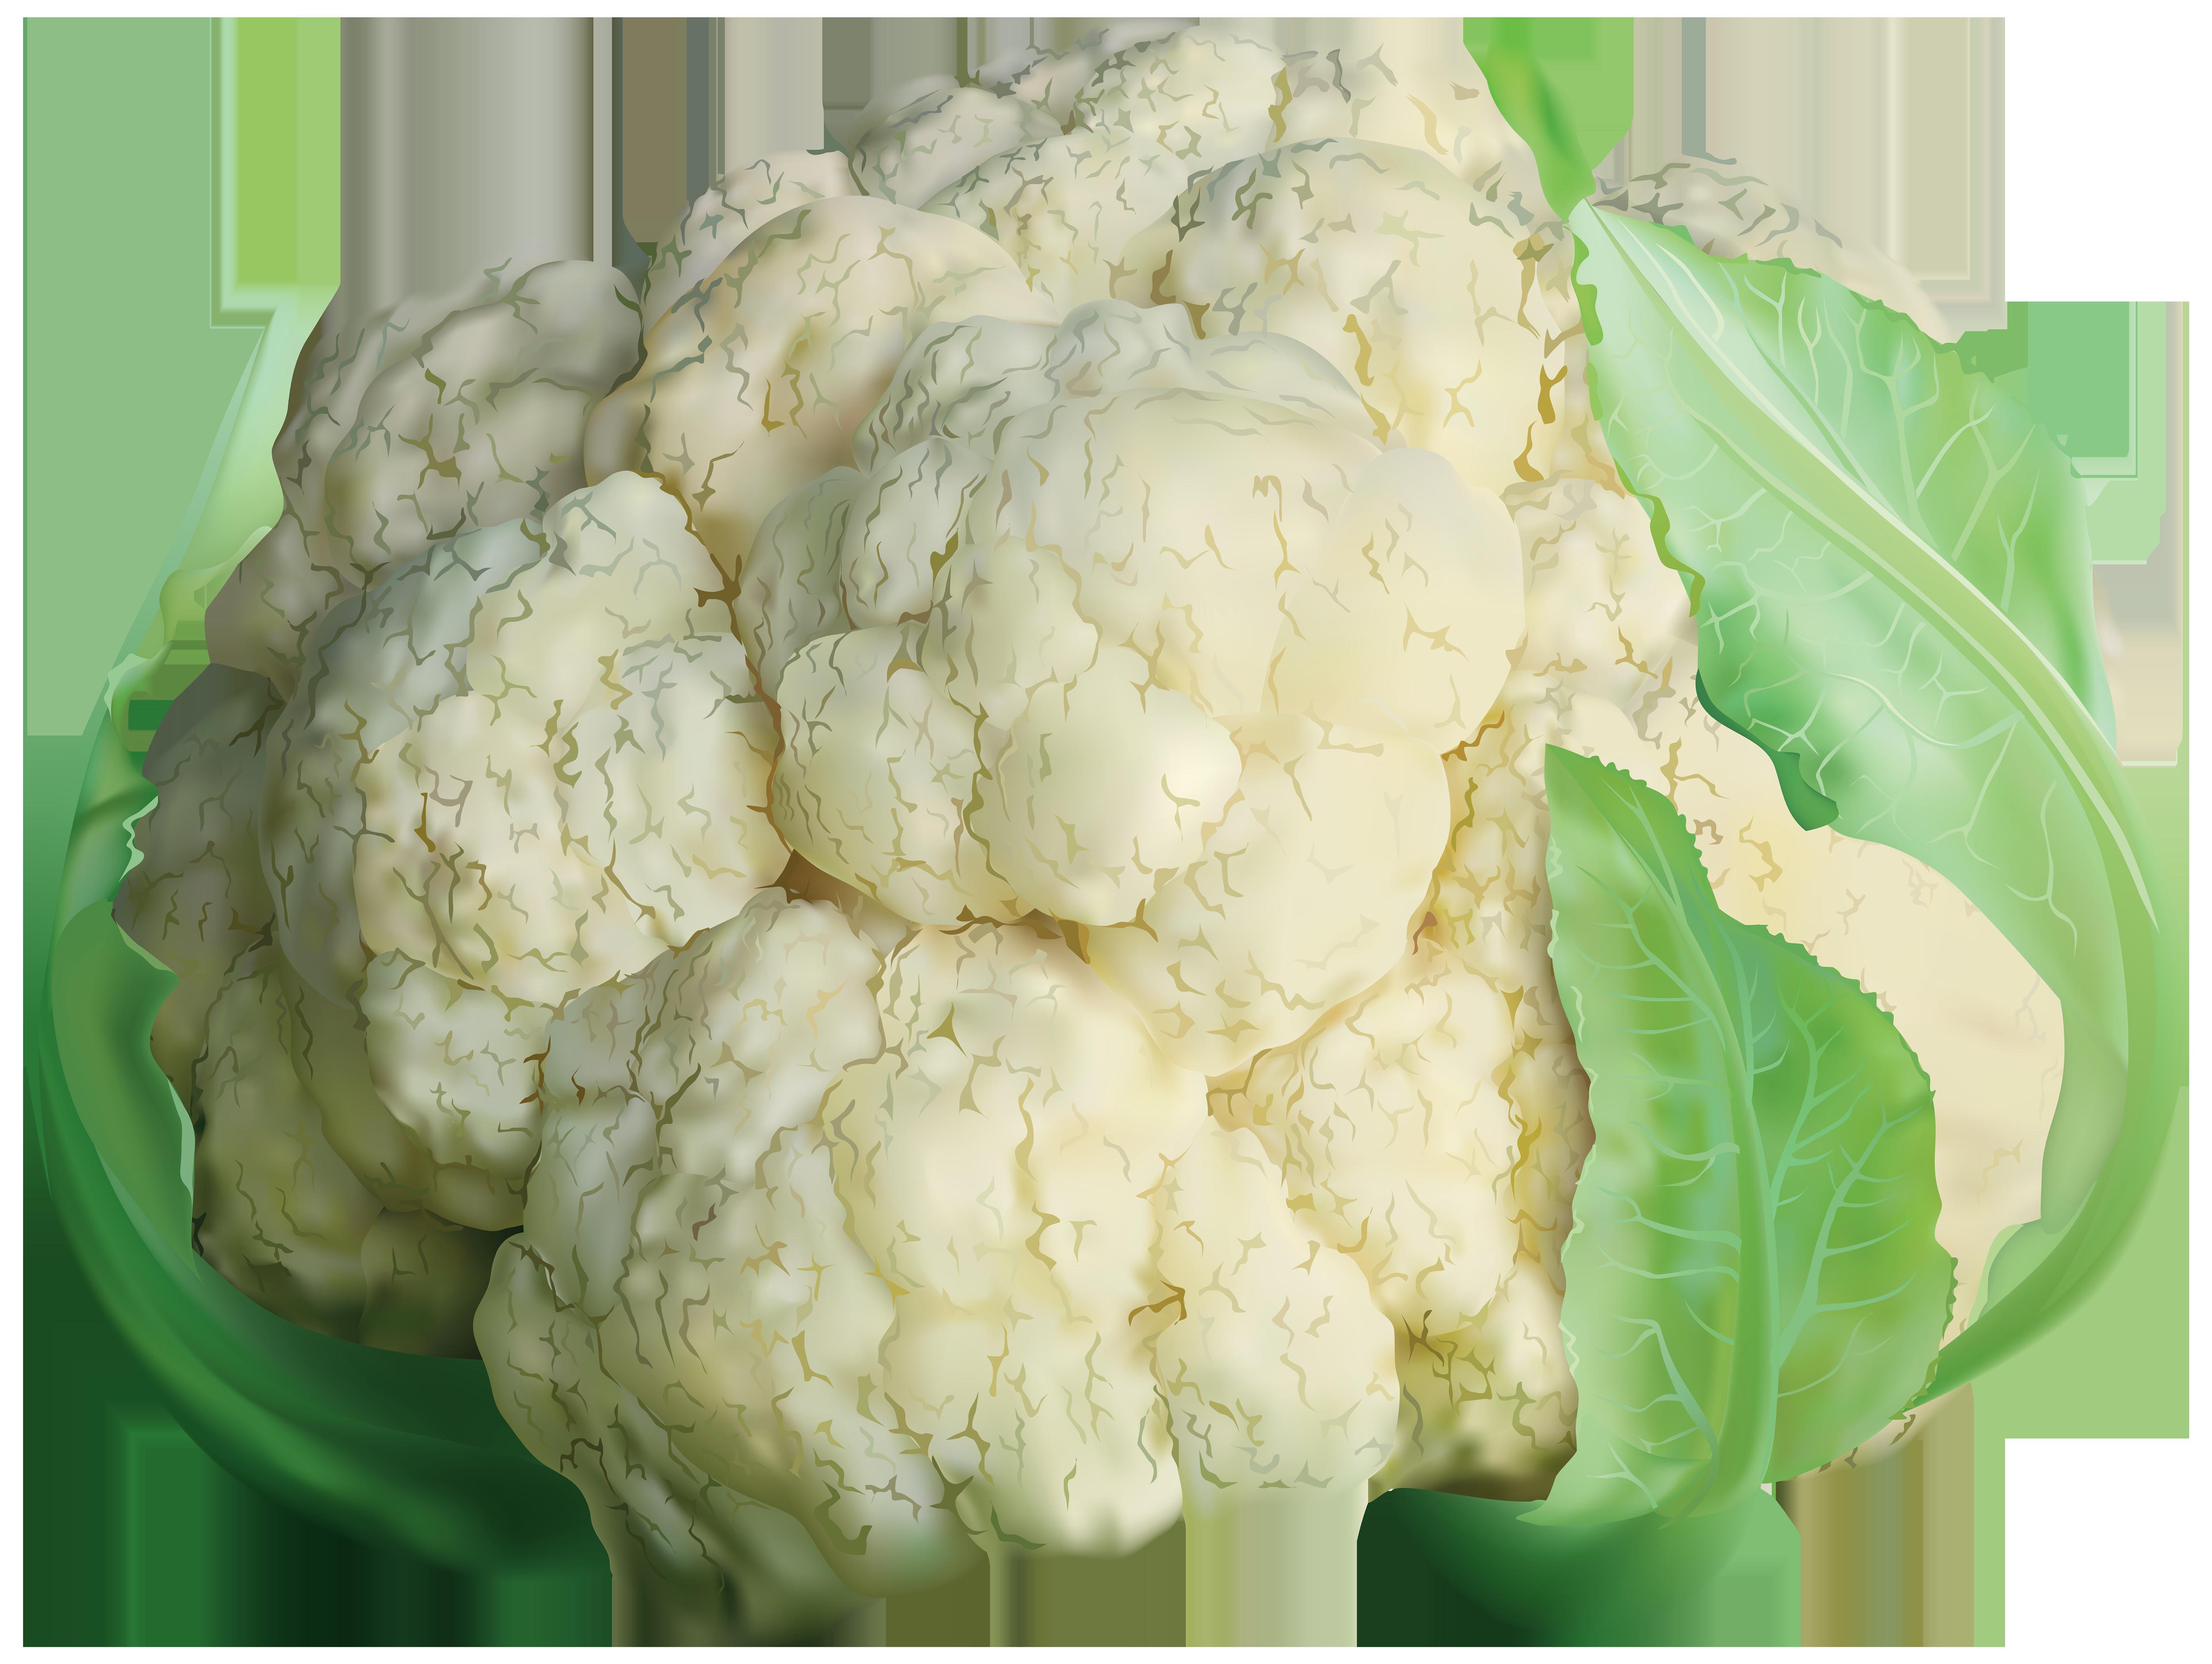 Cauliflower Transparent PNG Clip Art Image.